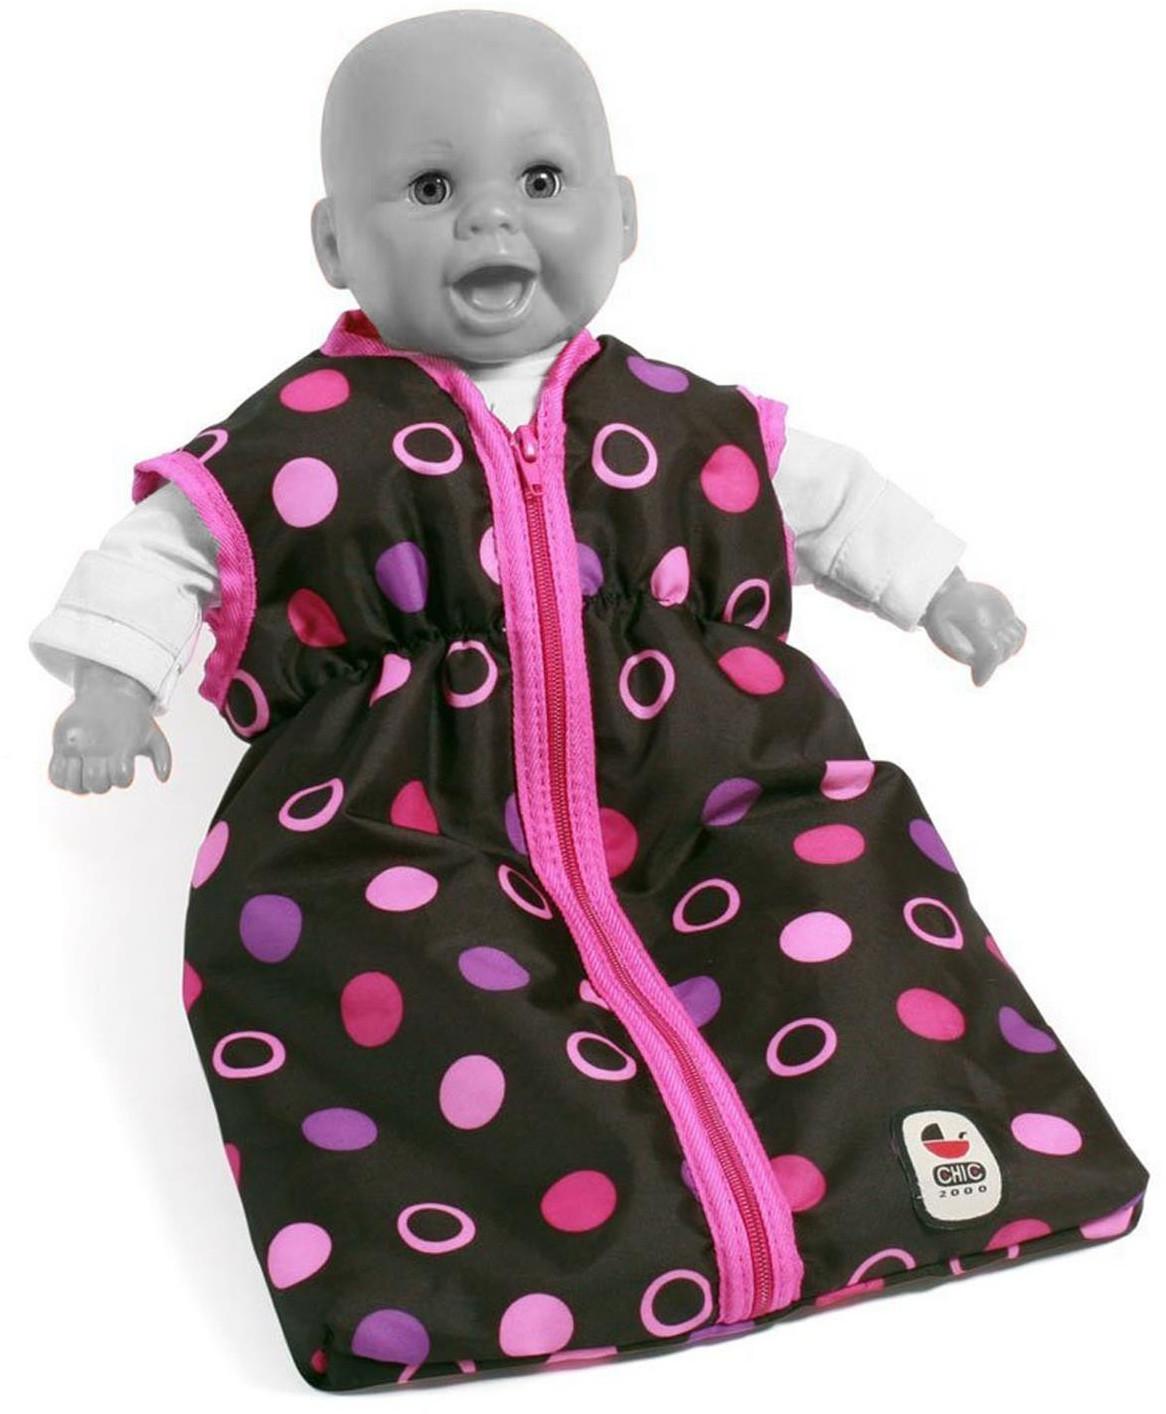 Bayer Chic 2000 Puppen Schlafsack Hot Pink Pearls NEU